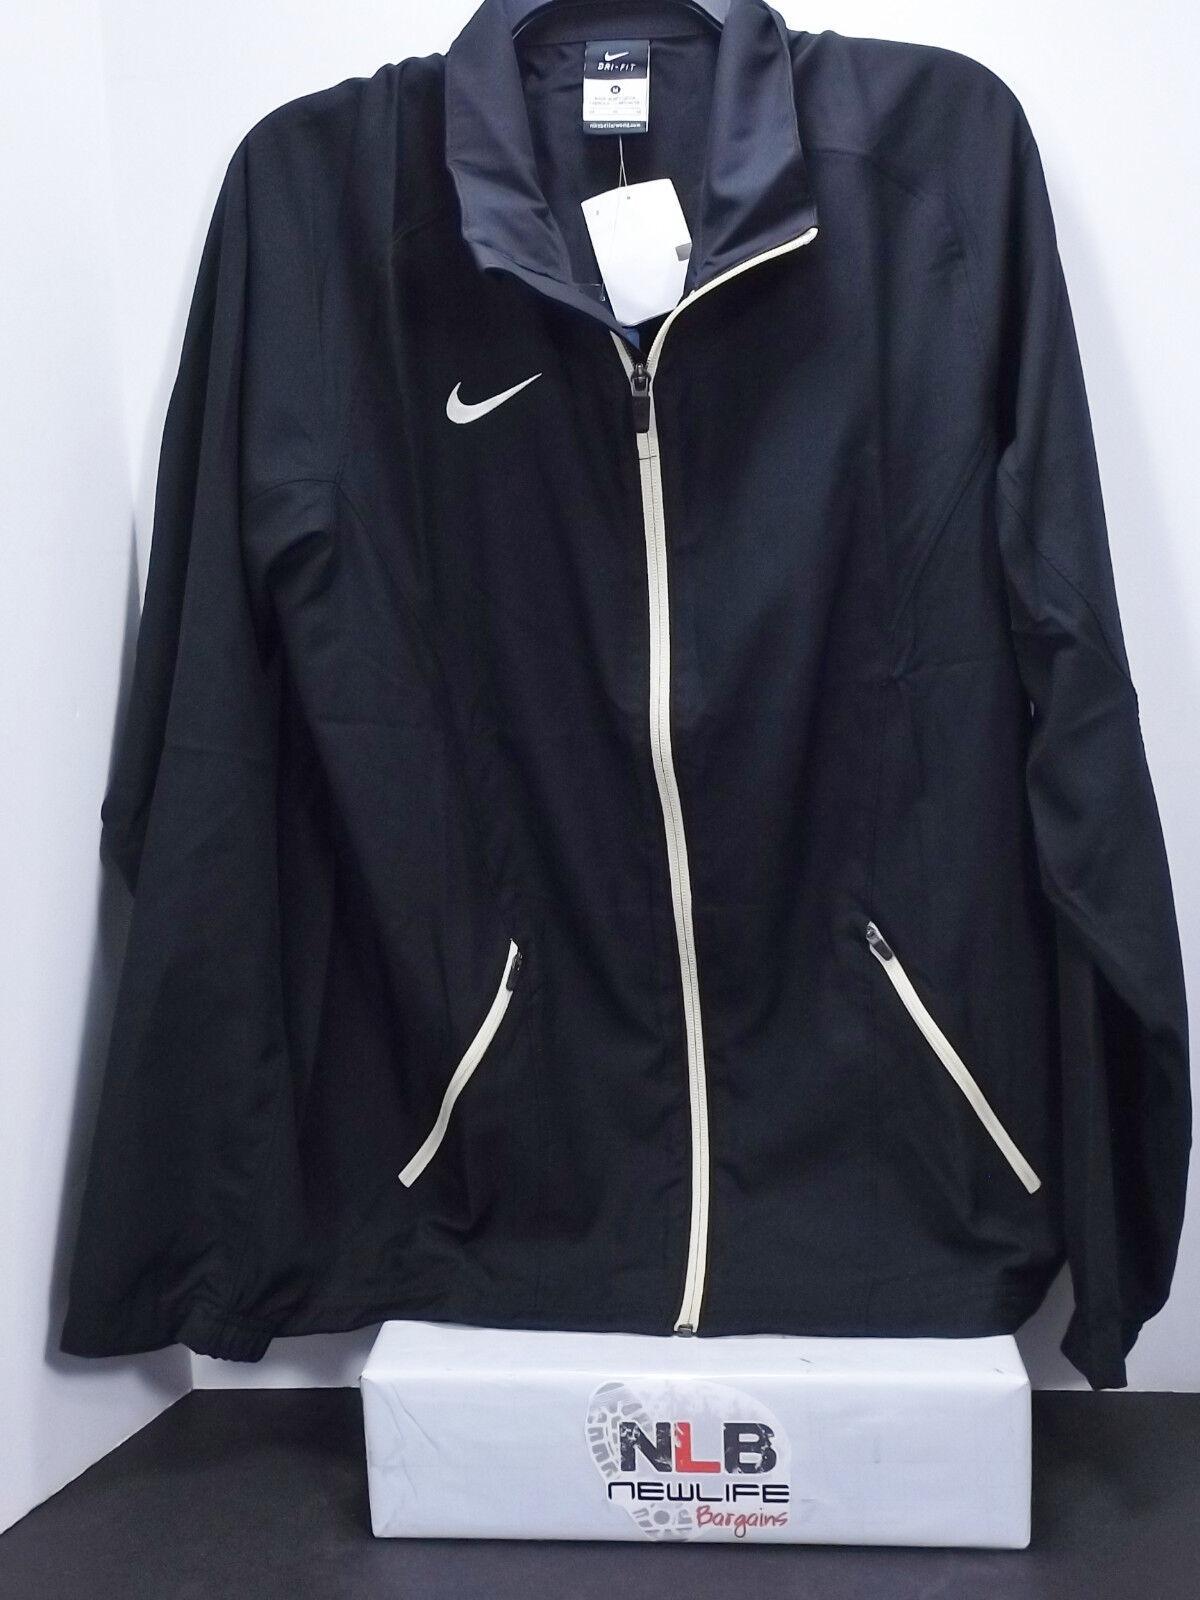 5d18fb252e Details about NEW Nike Disruption Game Men s Basketball Jacket 683357 016  Size Med Black Tan